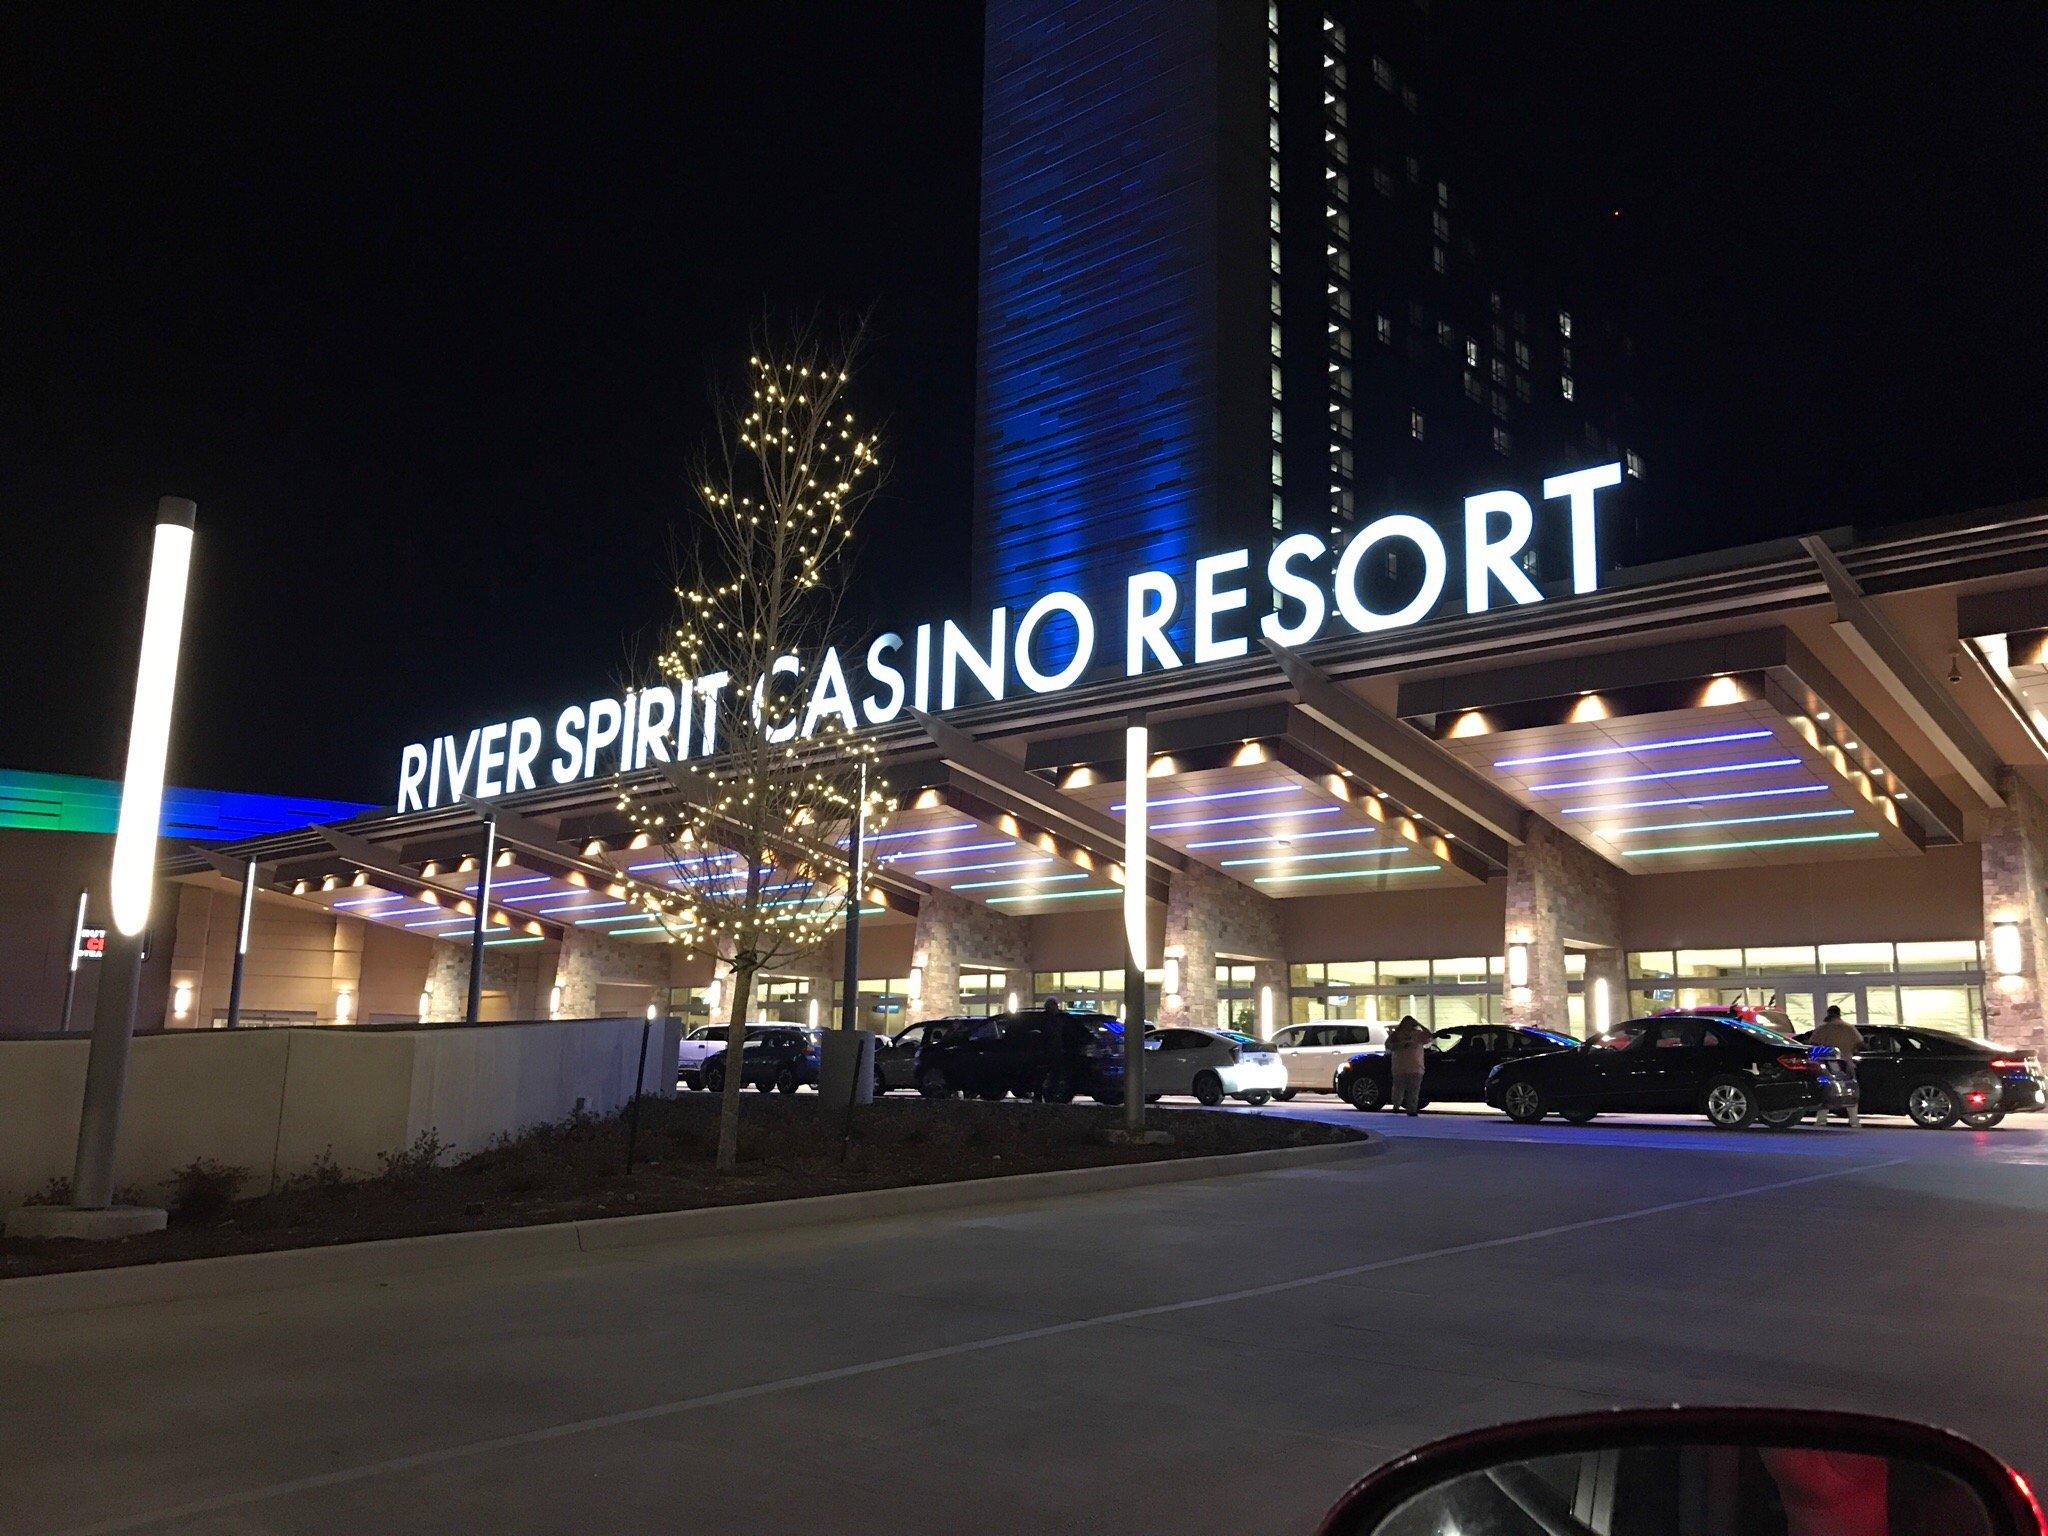 River spirit casino bingo